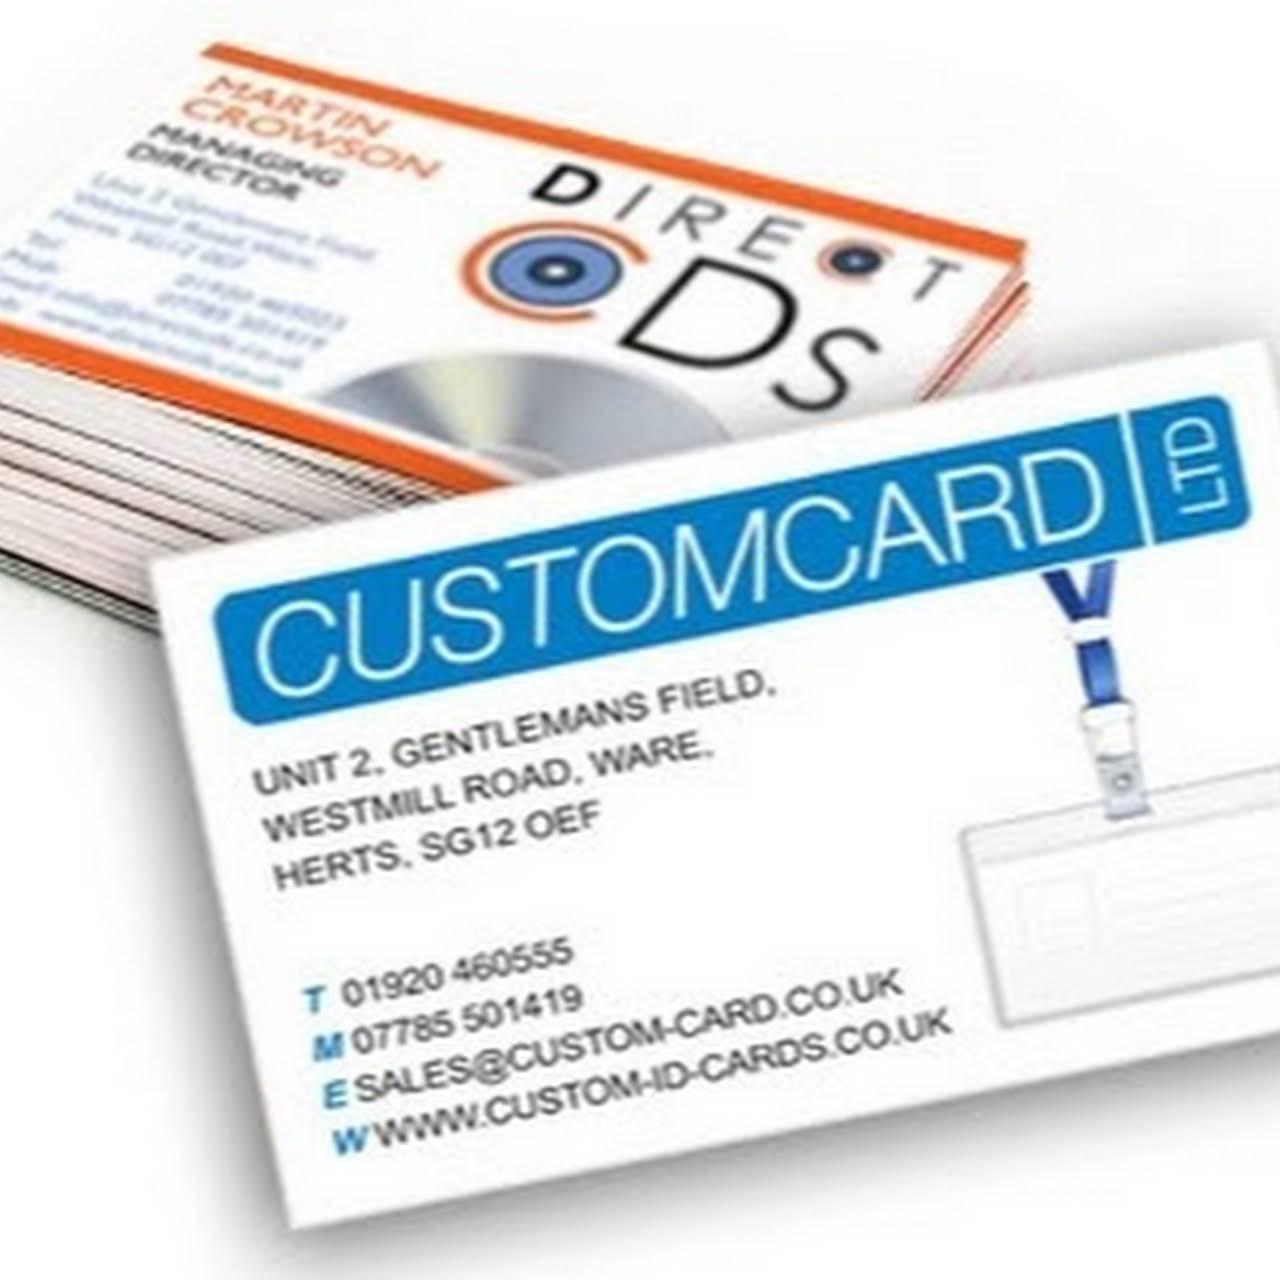 Direct CDs Ltd (CD Printing CD Duplication Services) - Manufacturer ...